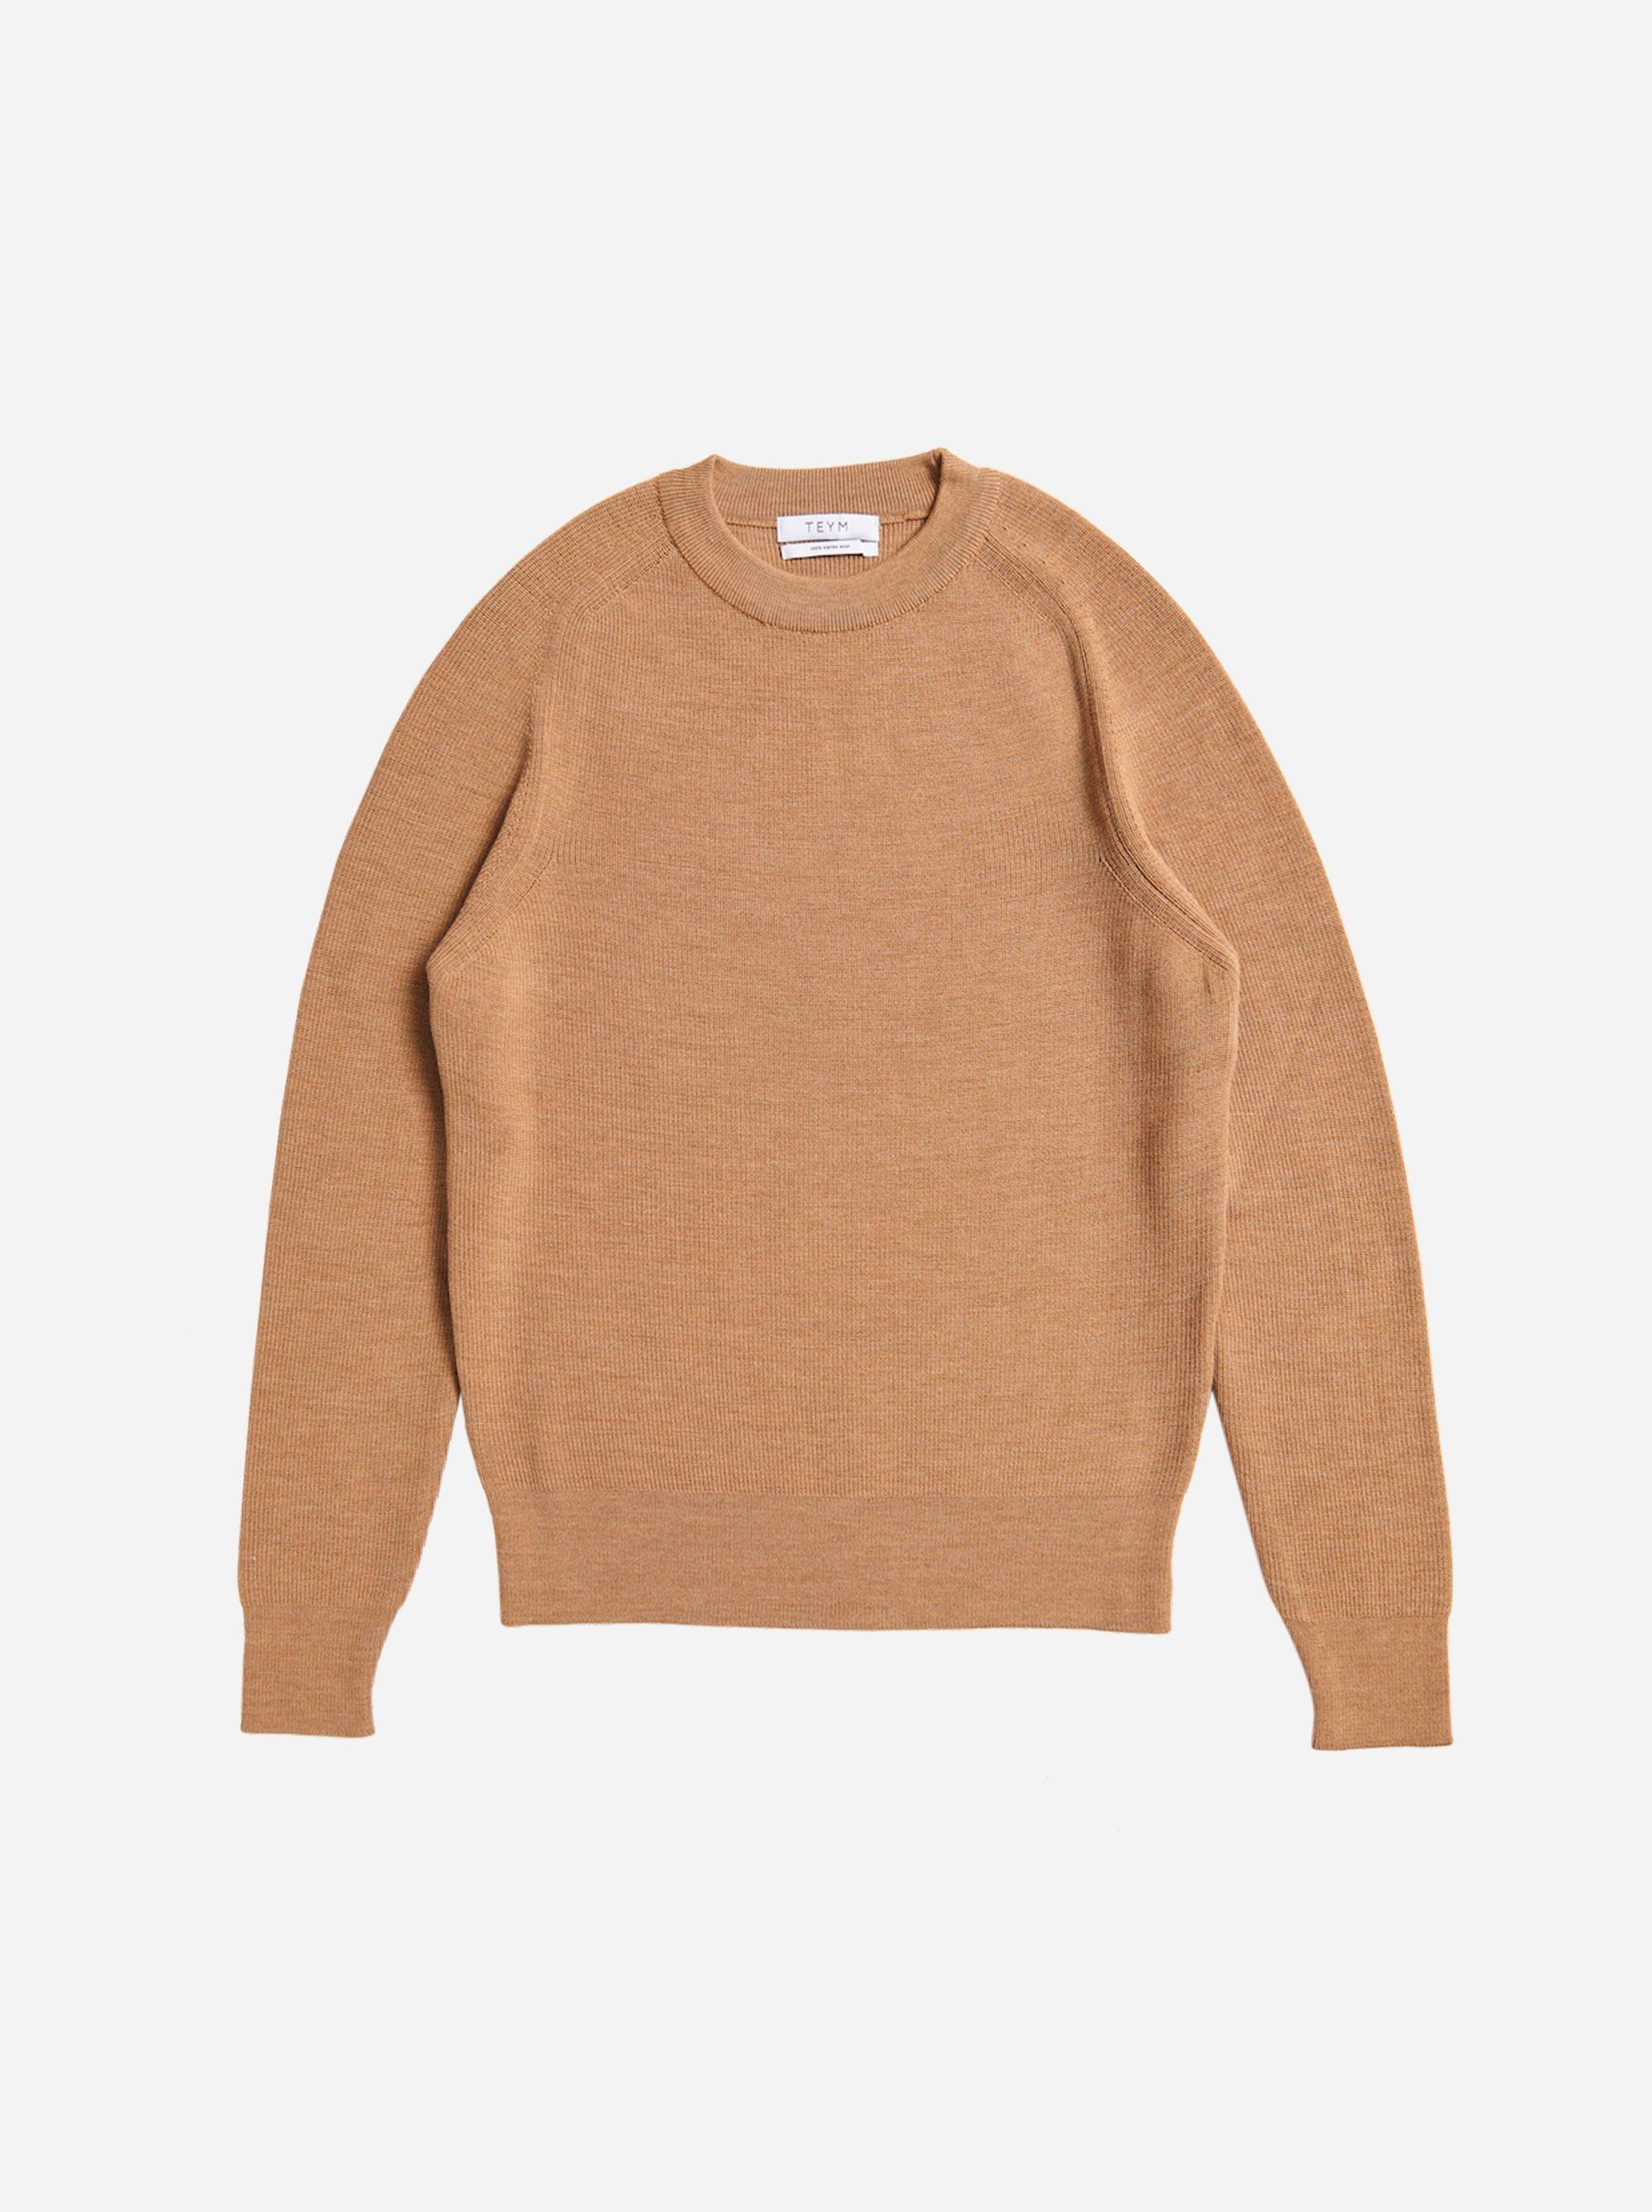 Teym - The Merino Sweater - Men - Camel - 4